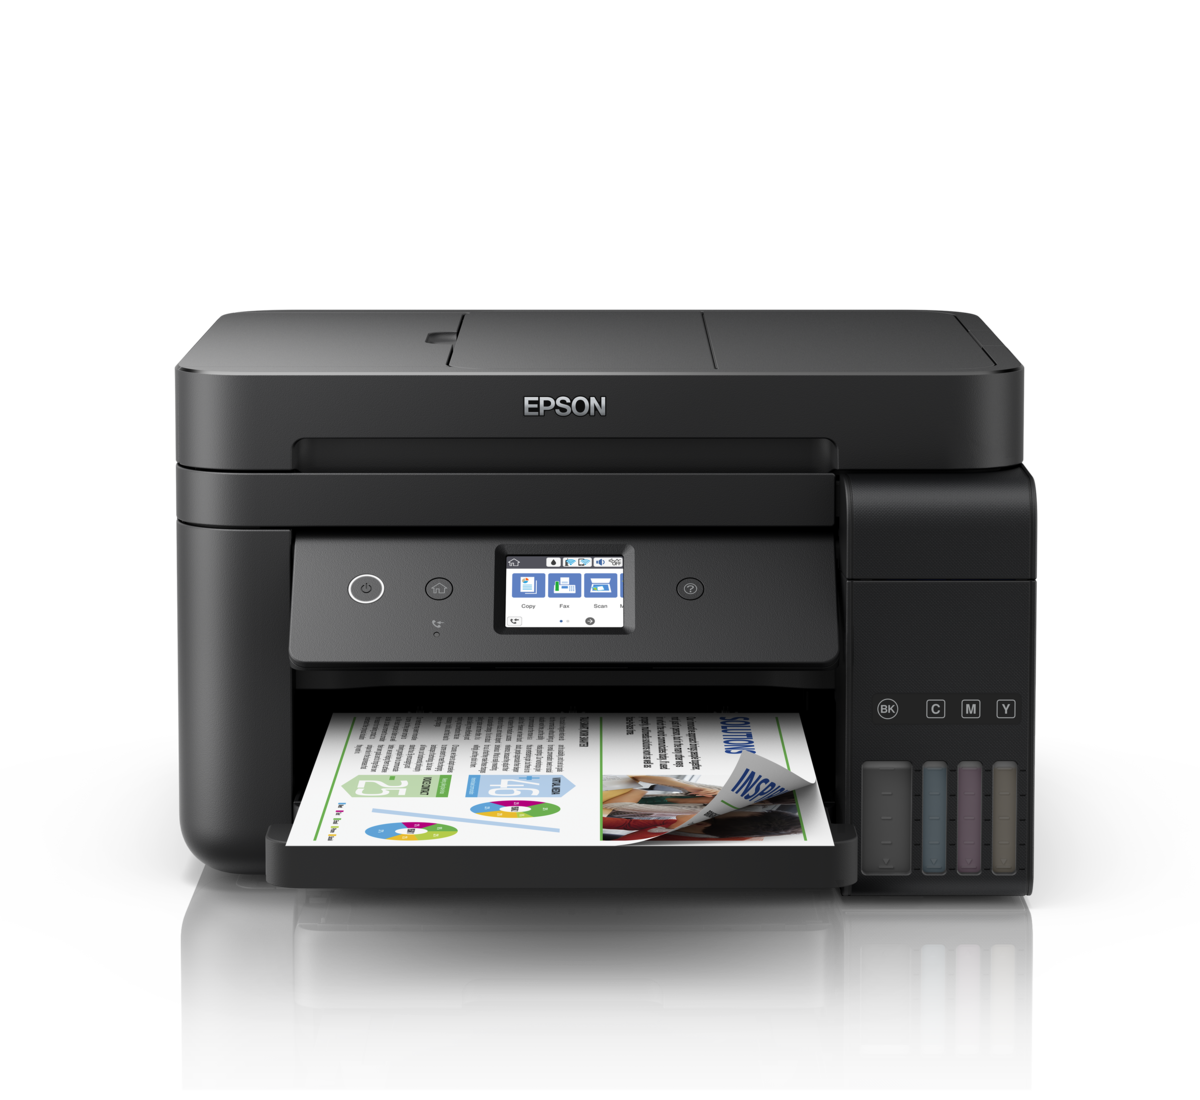 Epson L6190 Wi Fi Duplex All In One Ink Tank Printer With Adf Mainboard L805 Wifi